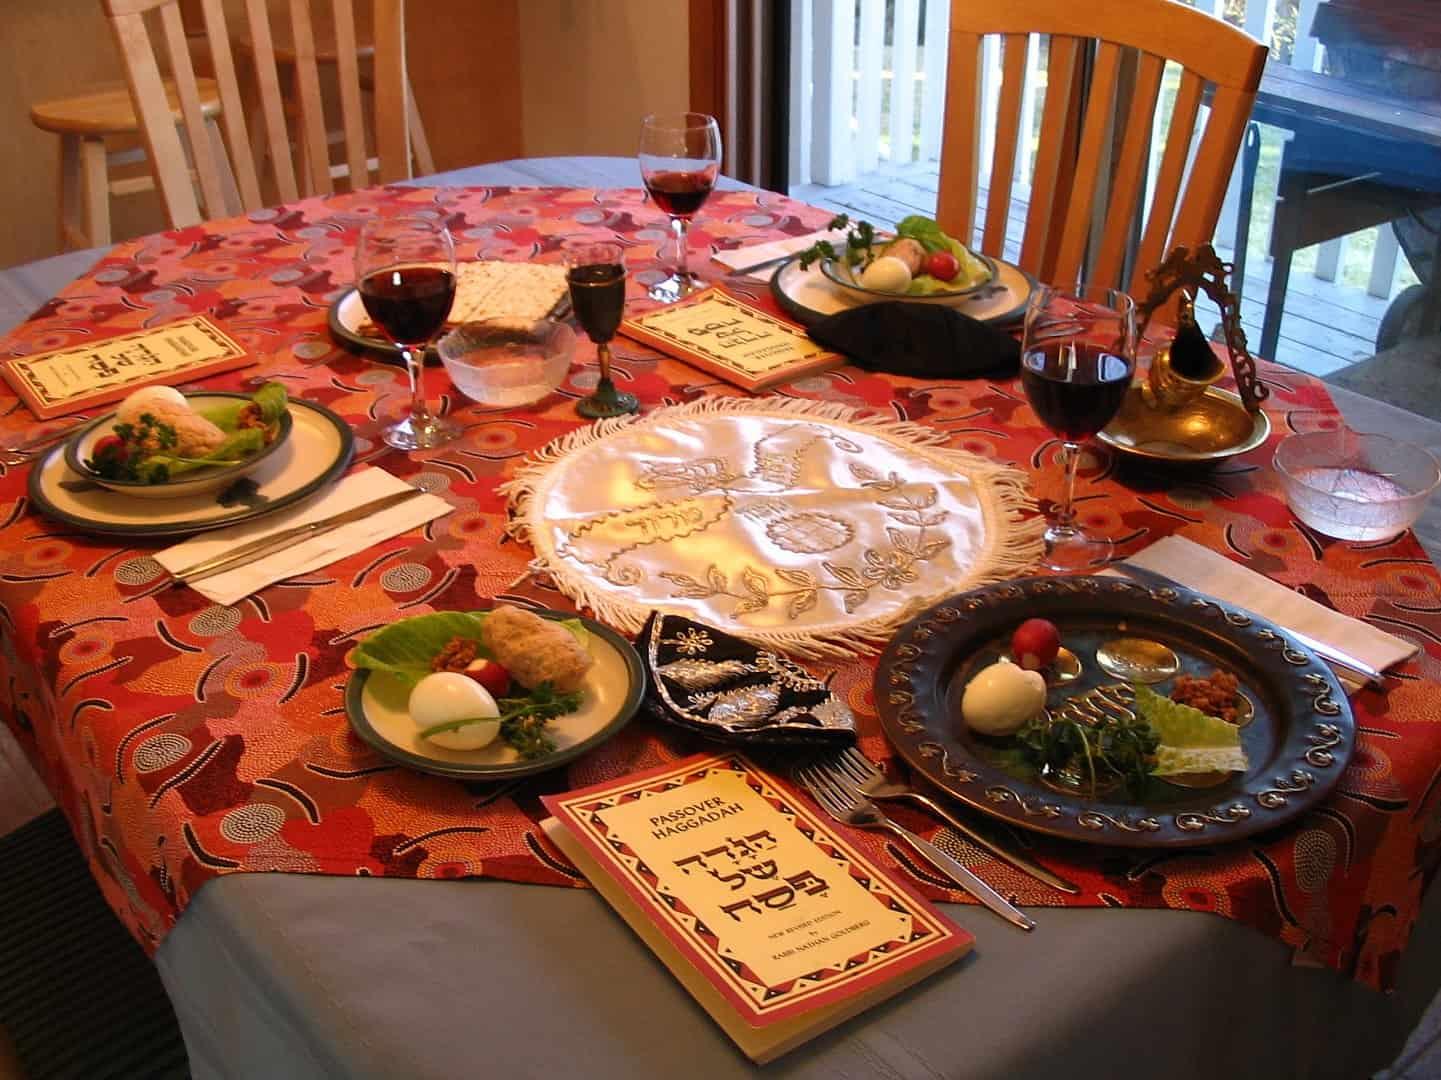 passover, judaism facts